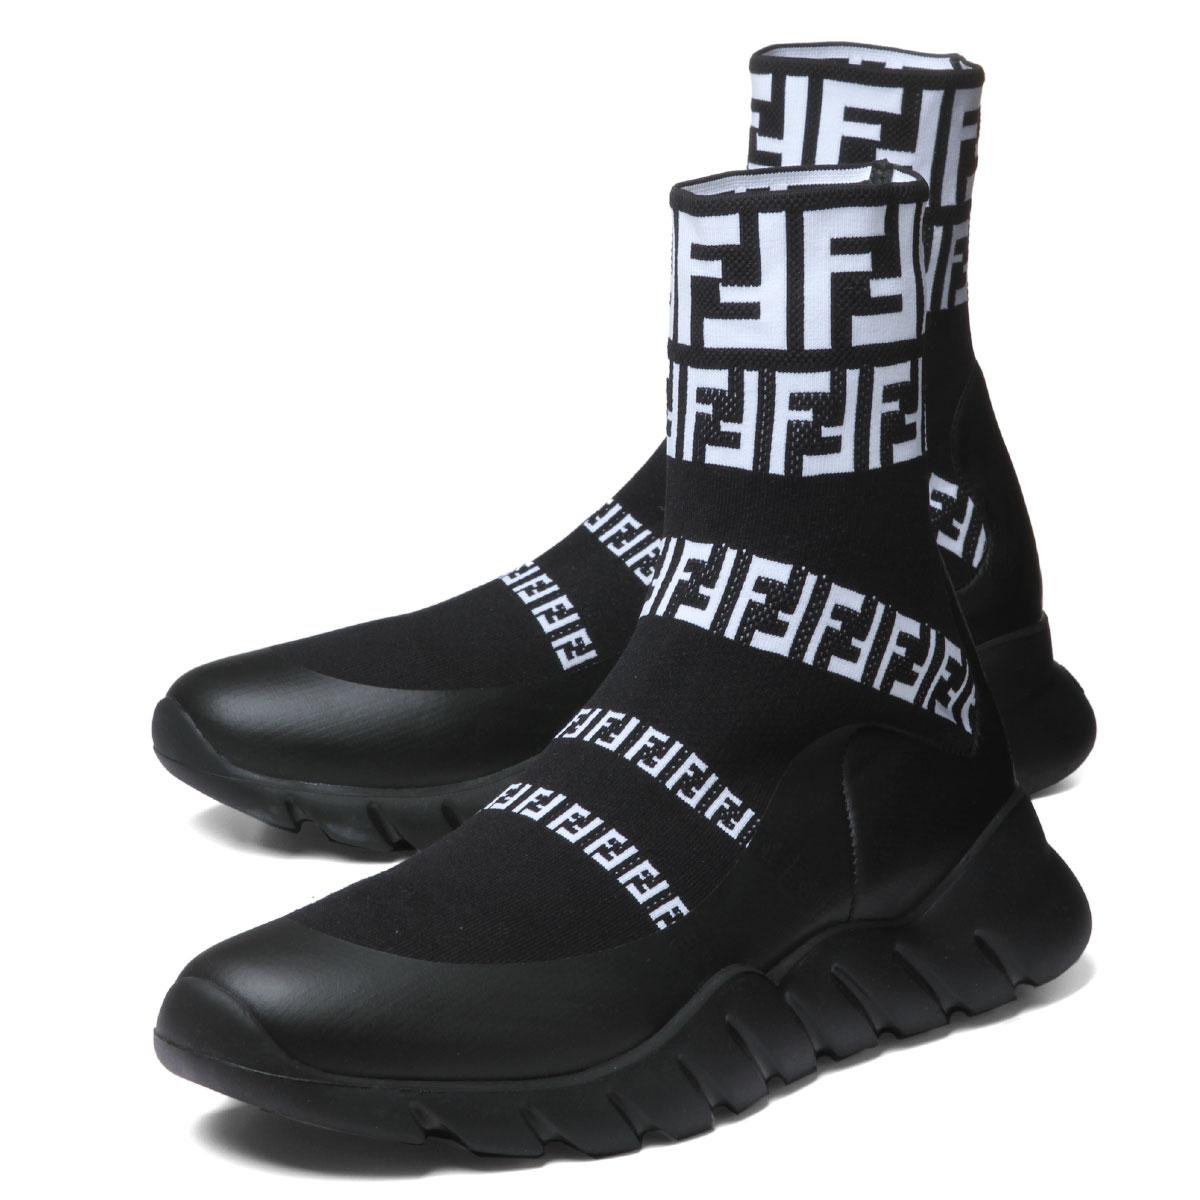 best authentic 50% price super quality Fendi FENDI shoes men 7E1163 A3XH F0Y68 sneakers higher frequency  elimination NERO BIANCO+NERO black